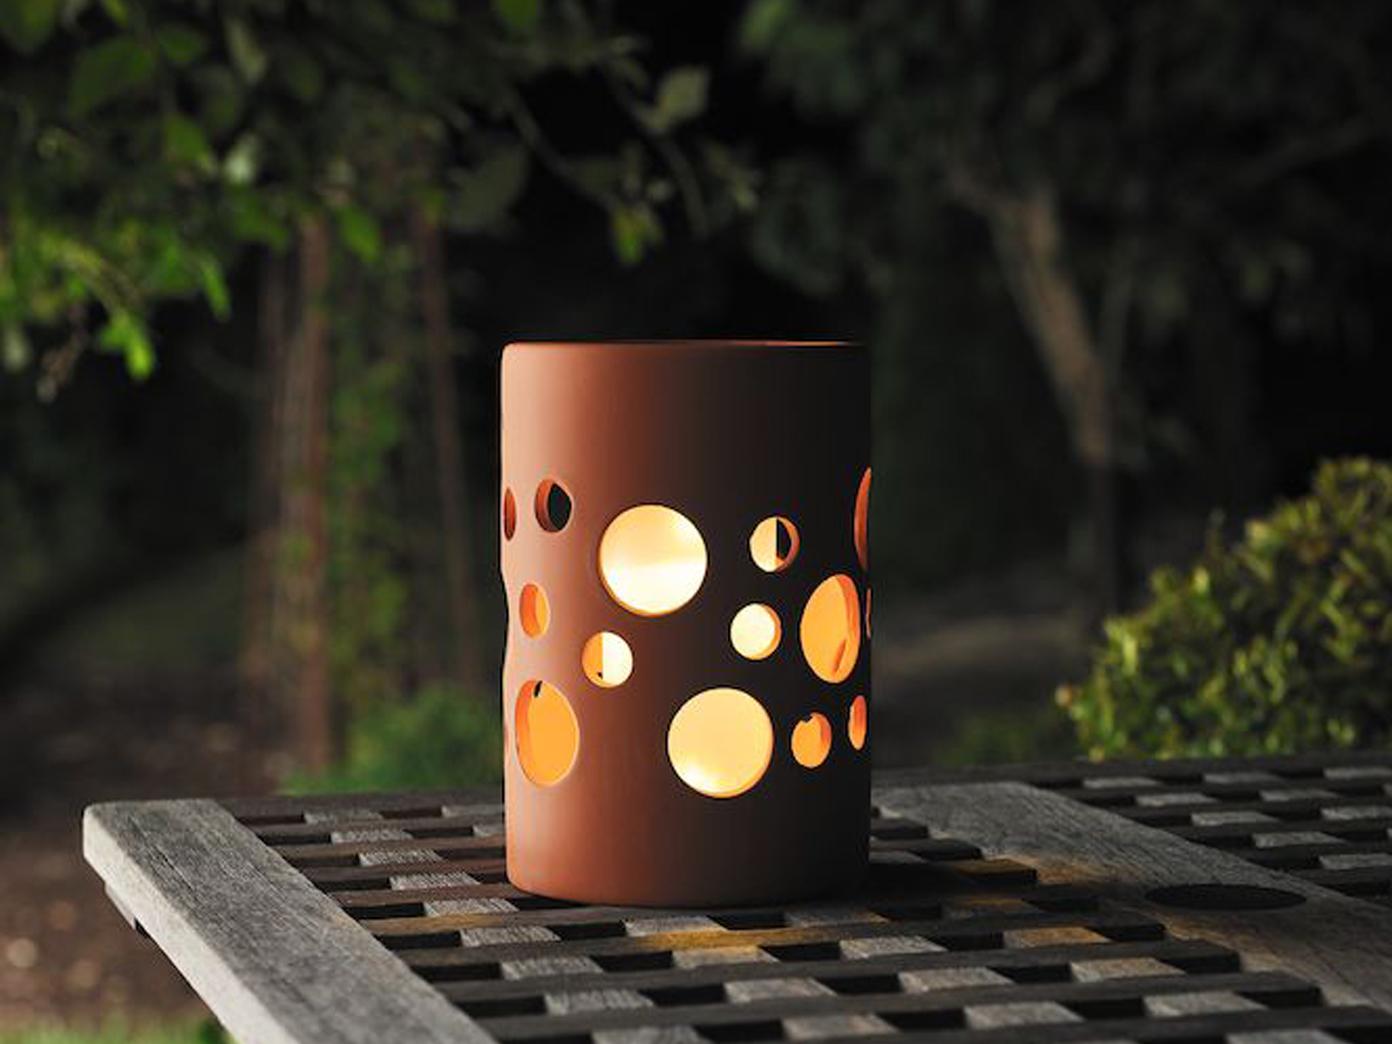 terracotta tischleuchte keramik solar led d mmerungssensor. Black Bedroom Furniture Sets. Home Design Ideas